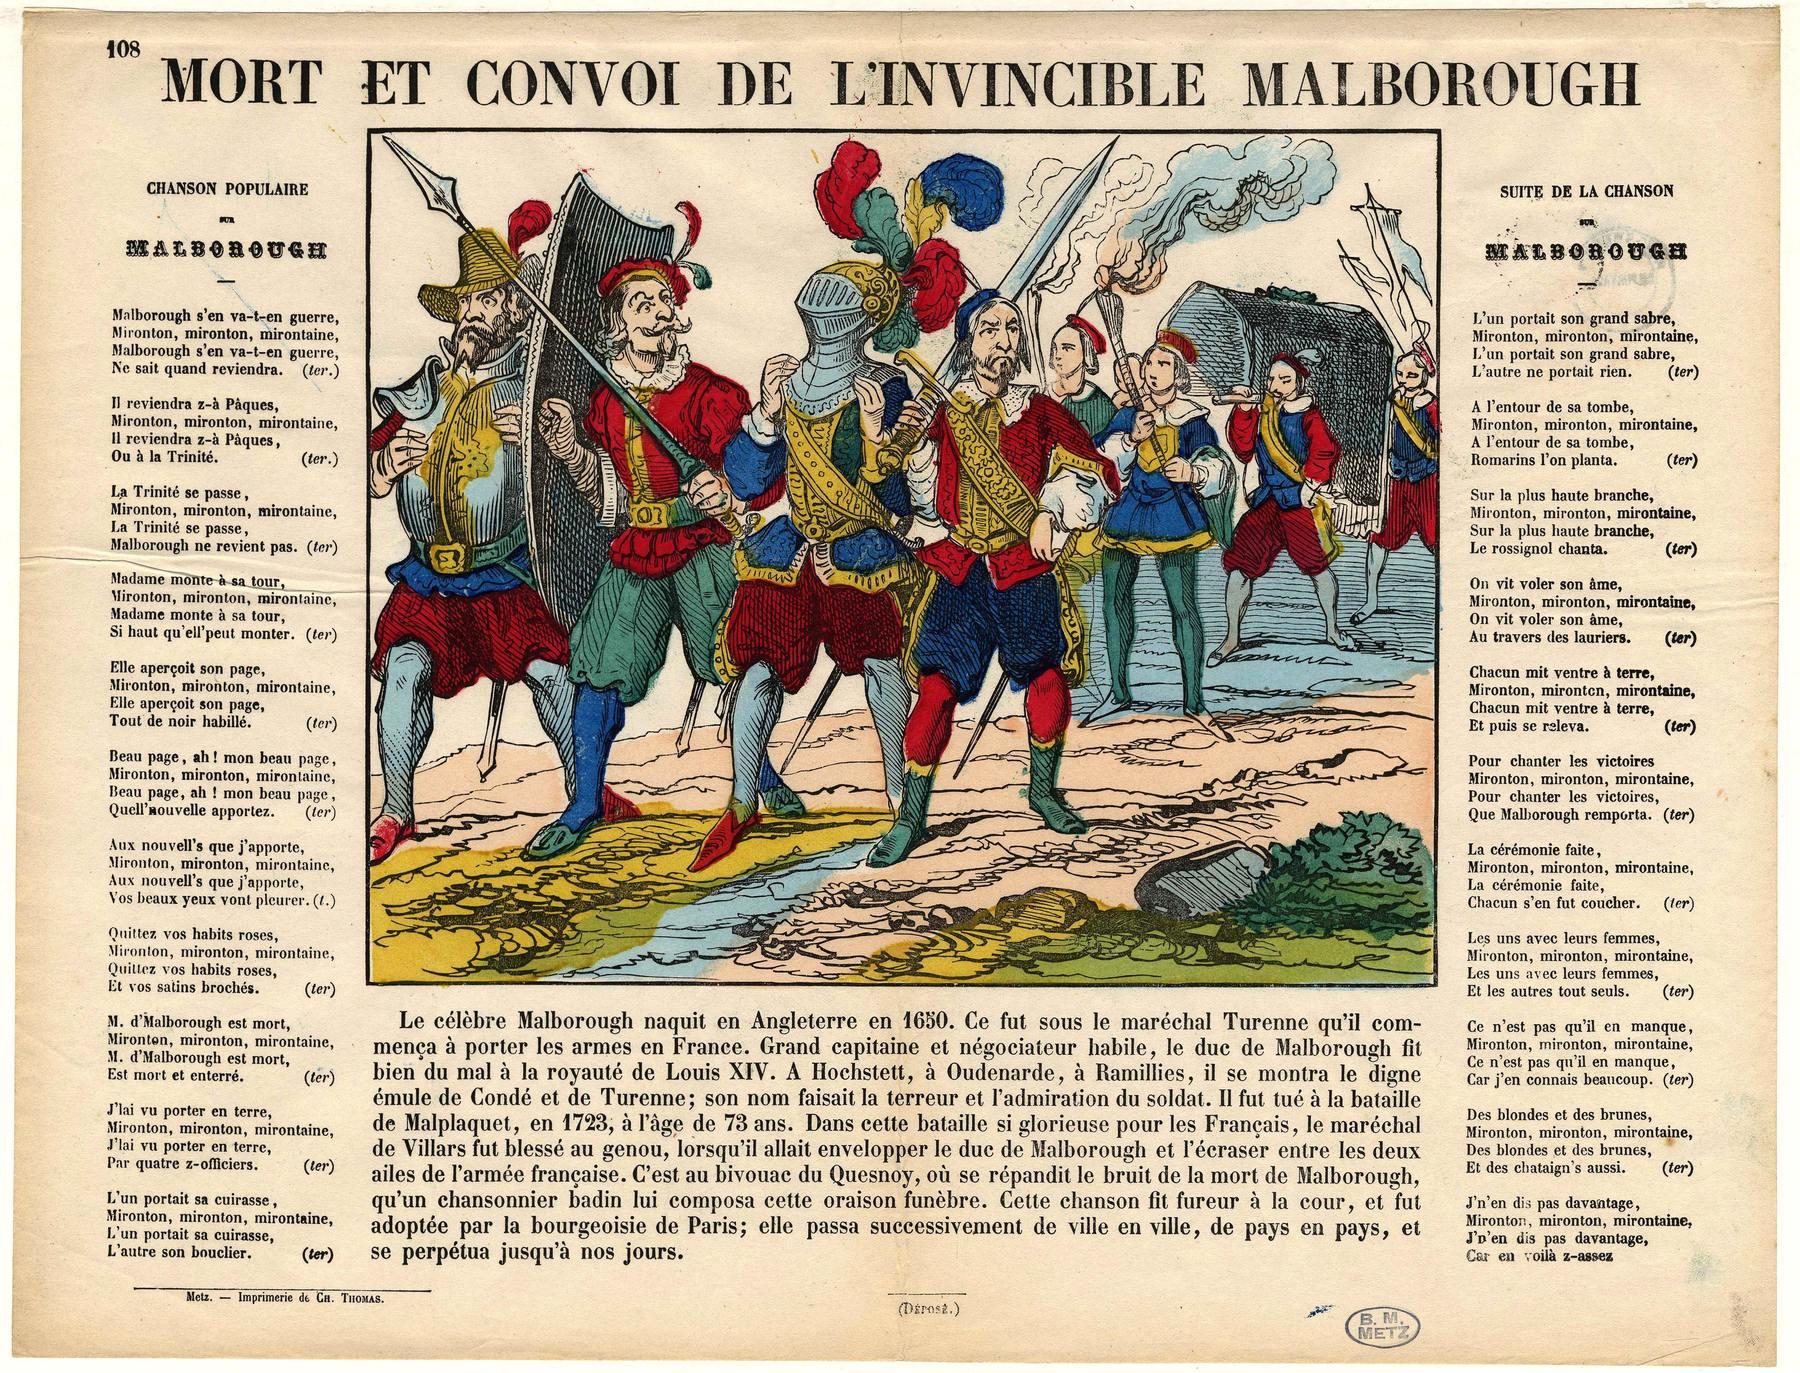 Contenu du Mort et convoi de l'invincible Malborough